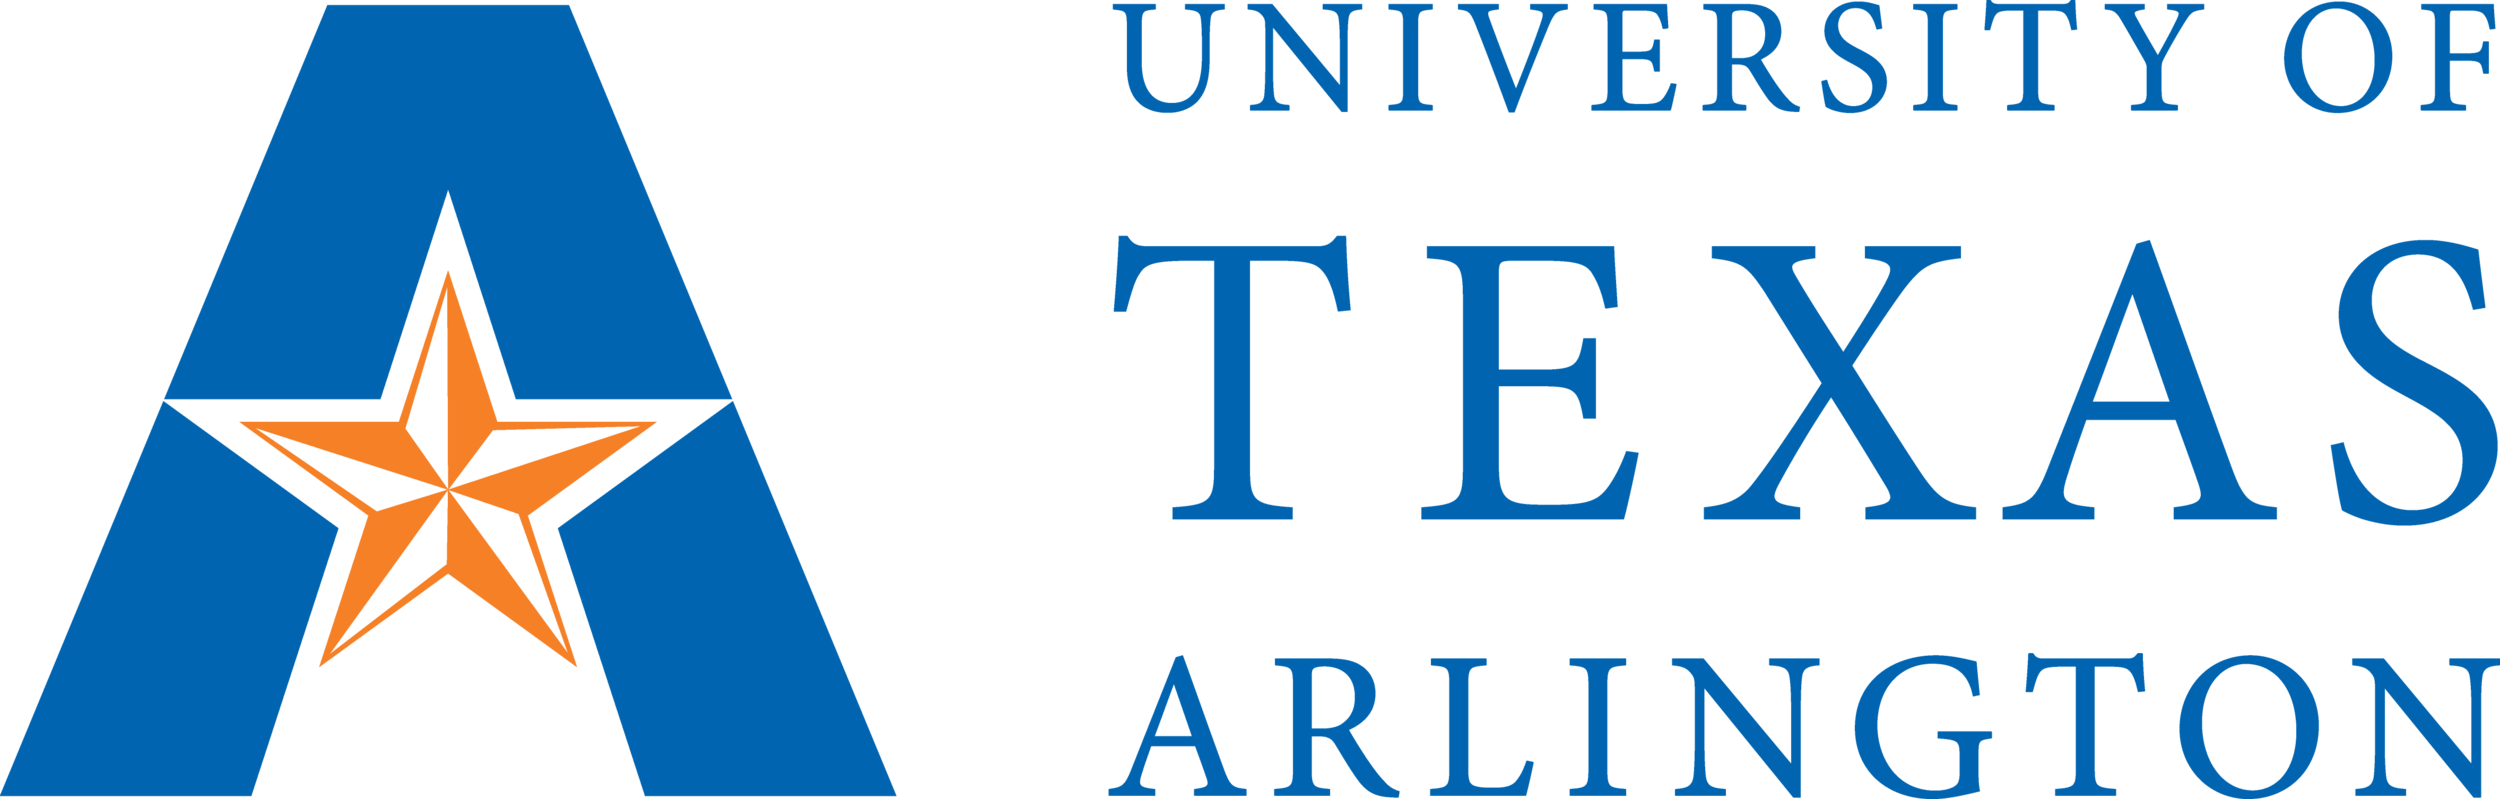 UofTArlington-logo.png